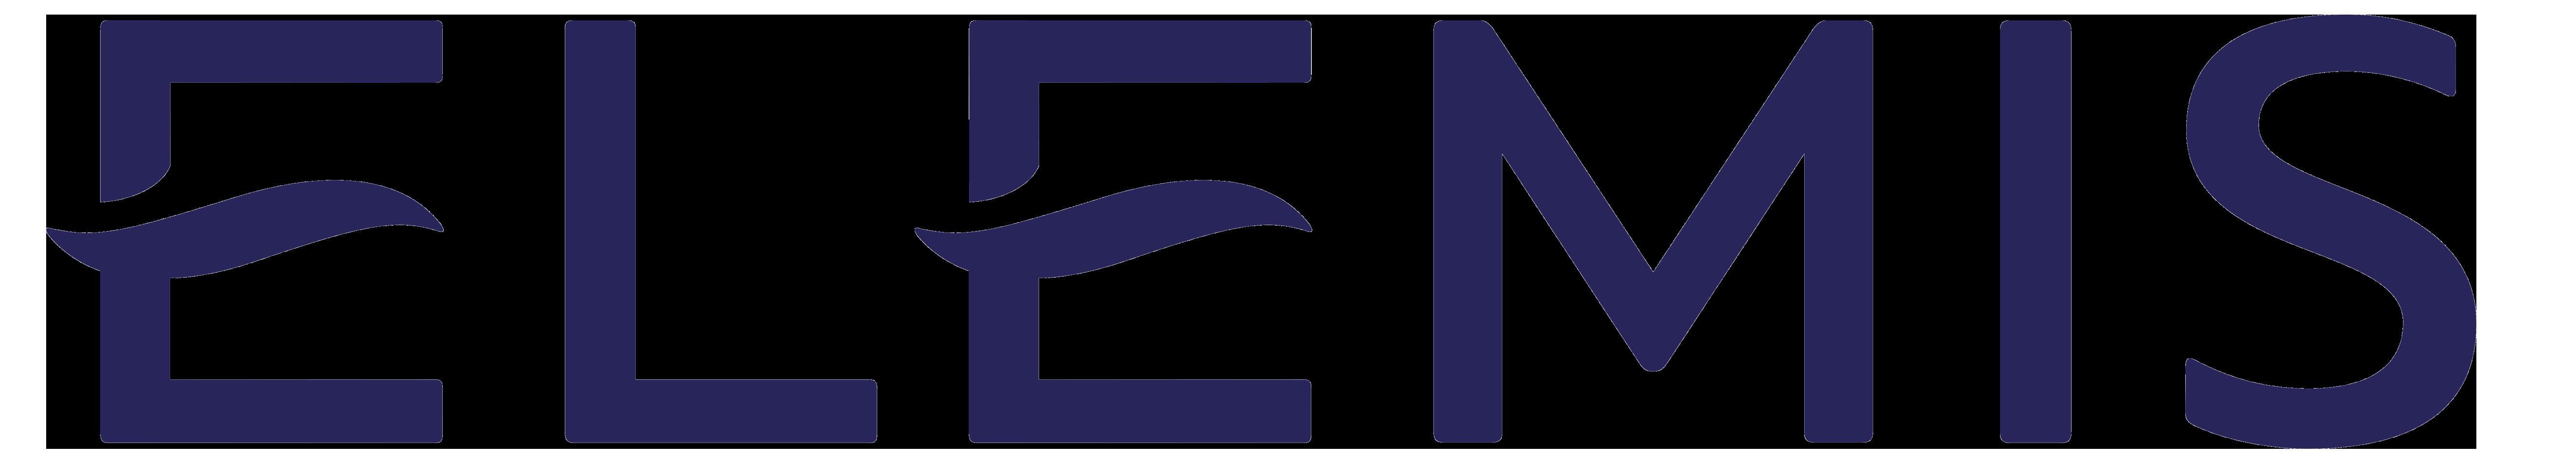 Risultati immagini per elemis logo png